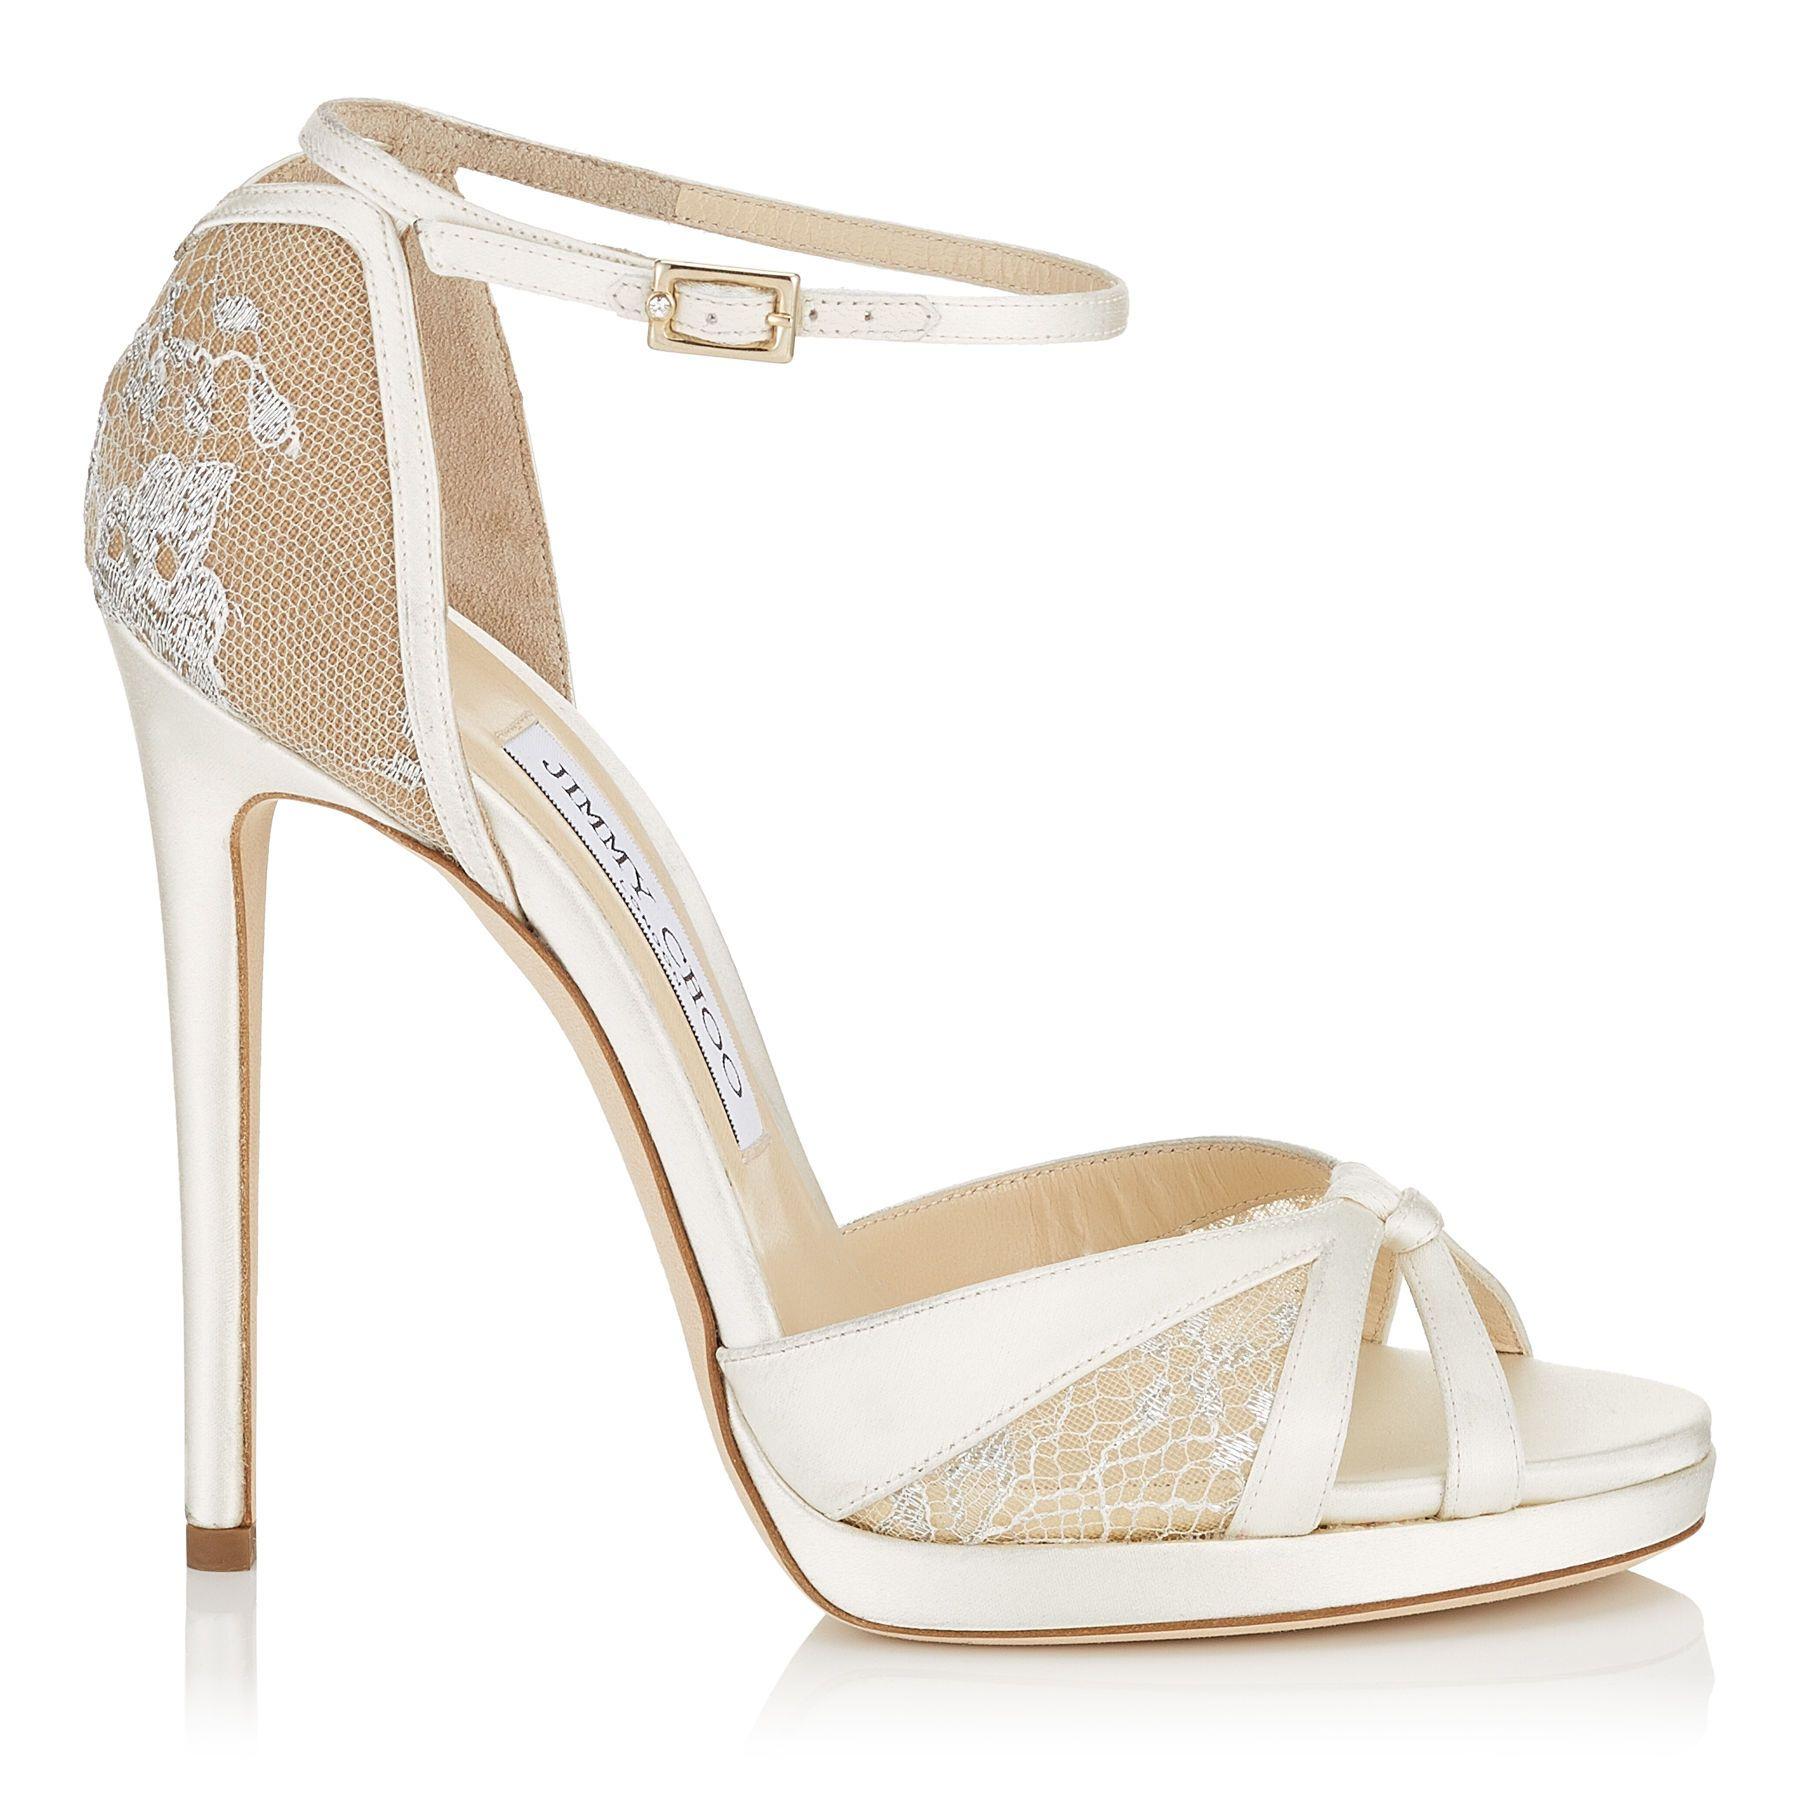 Jimmy Choo Talia 120 Wedding Shoesdream